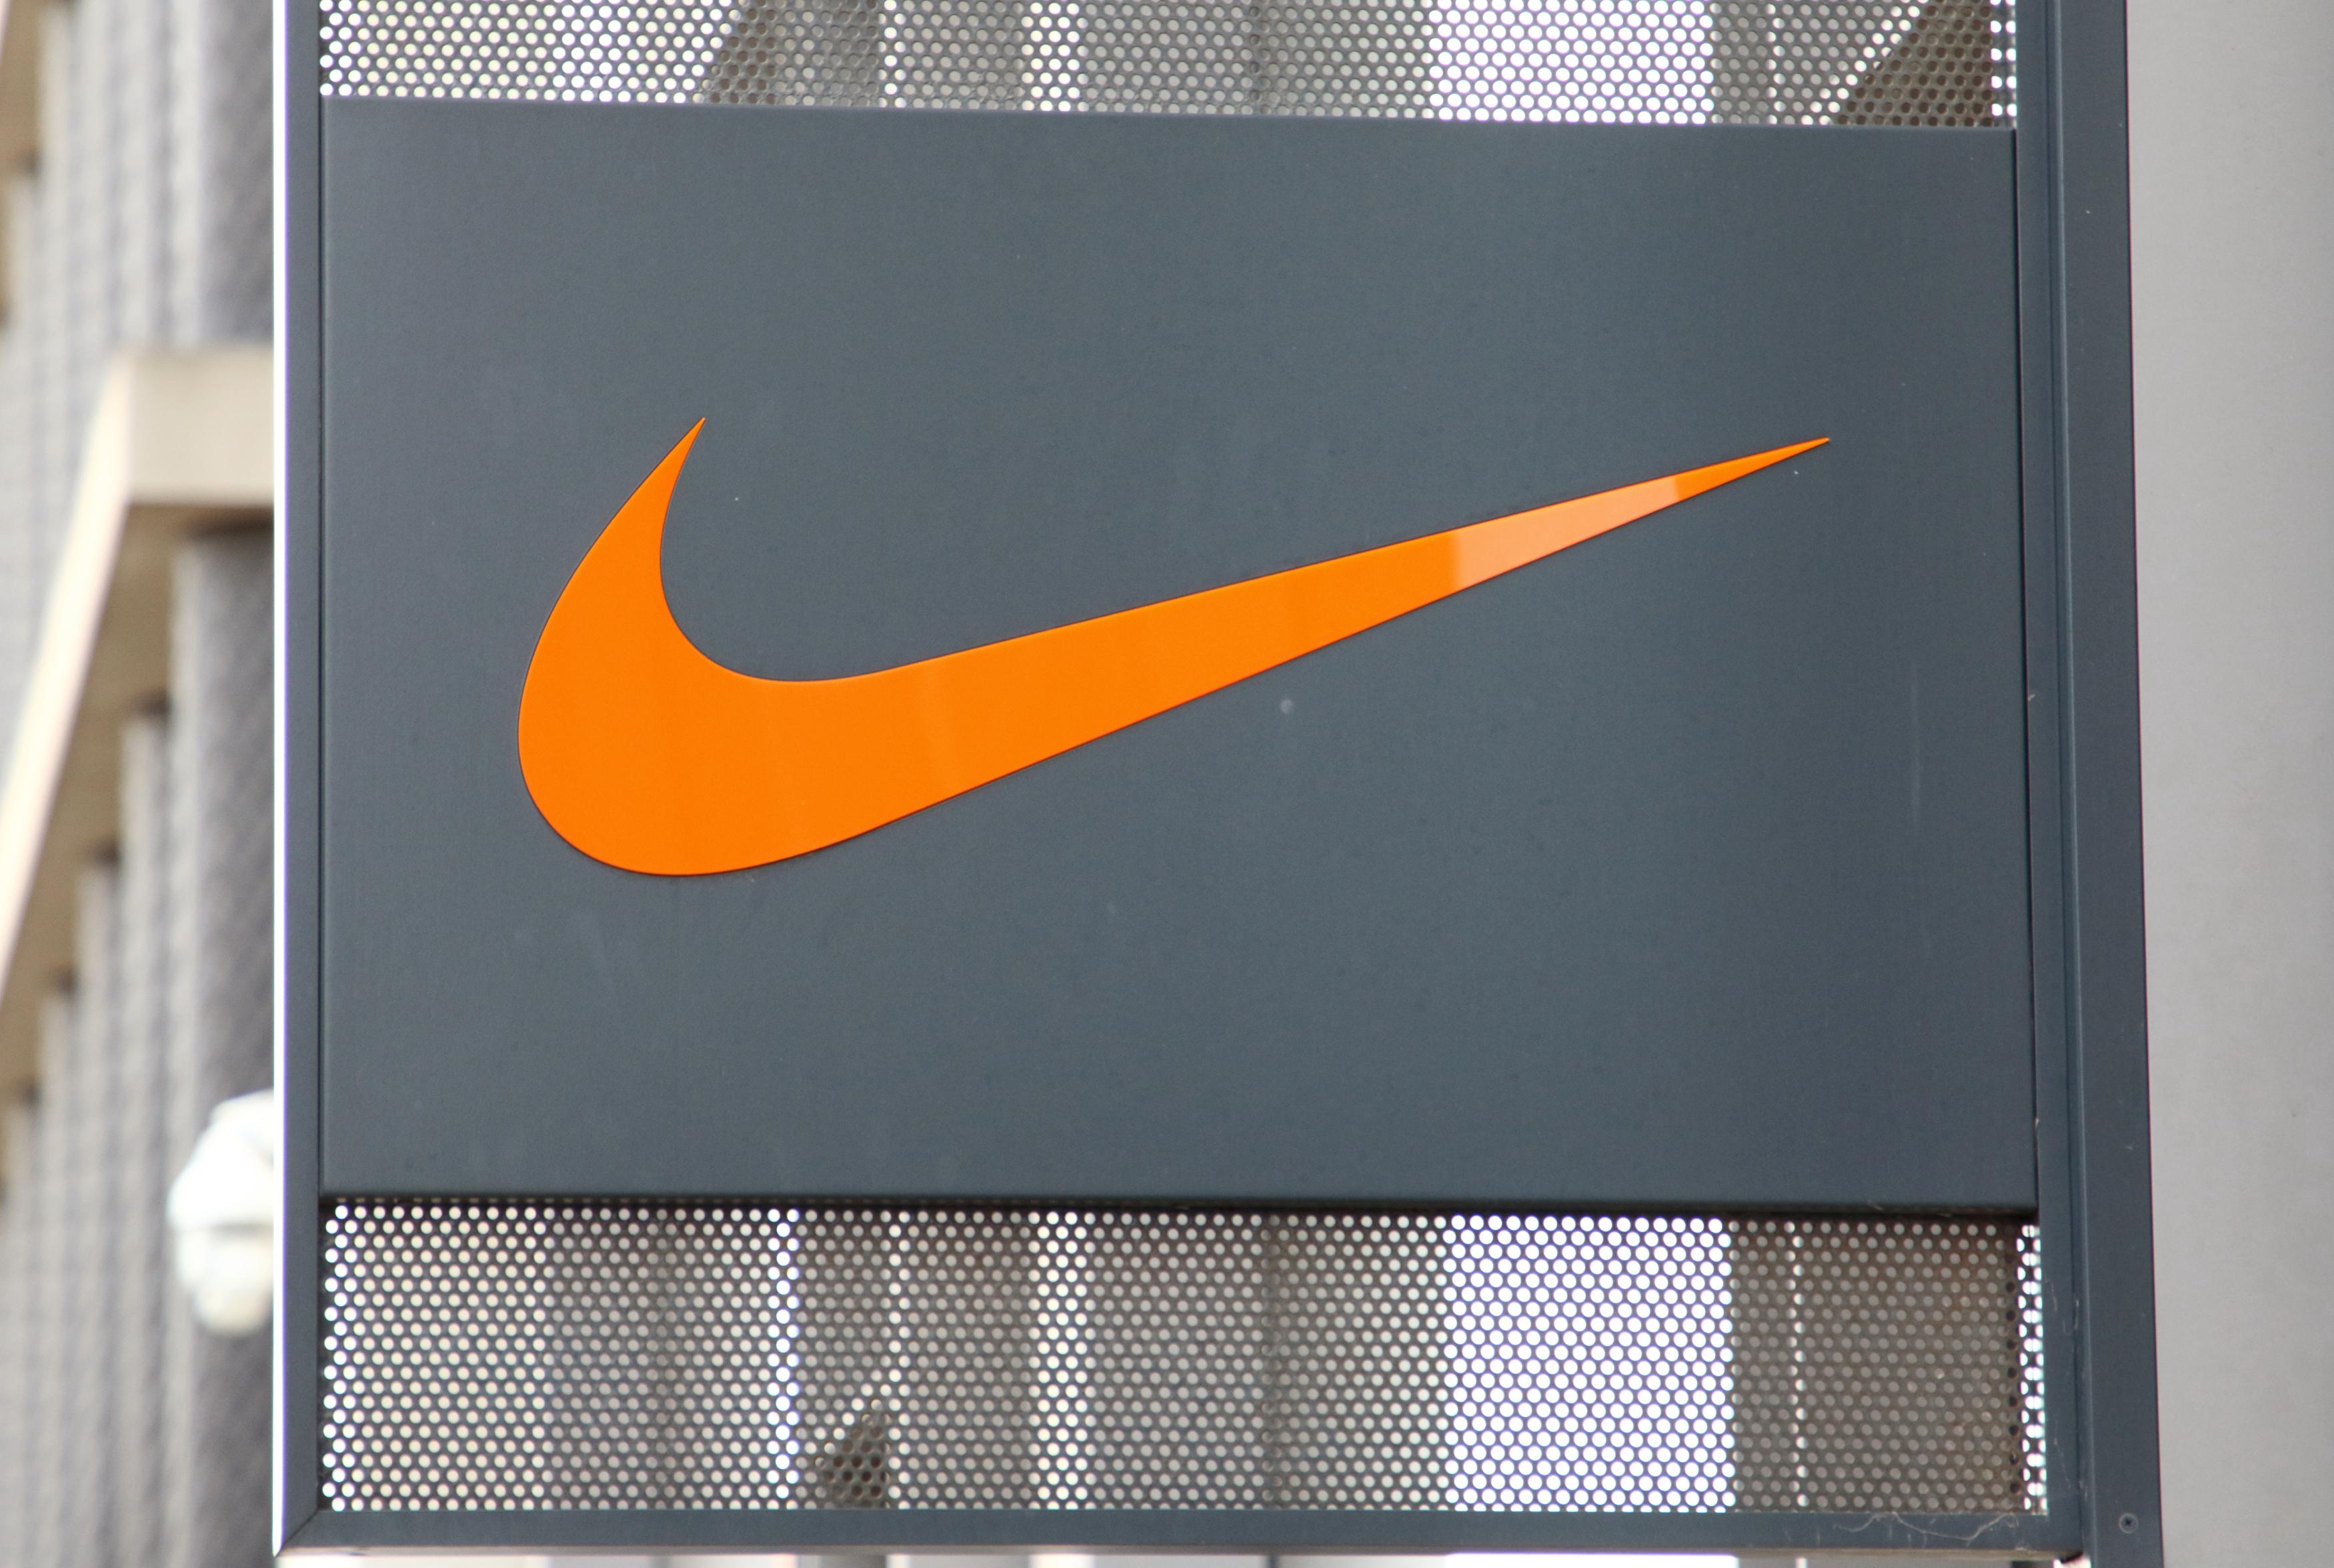 Nike Swoosh logo outside a Nike shop